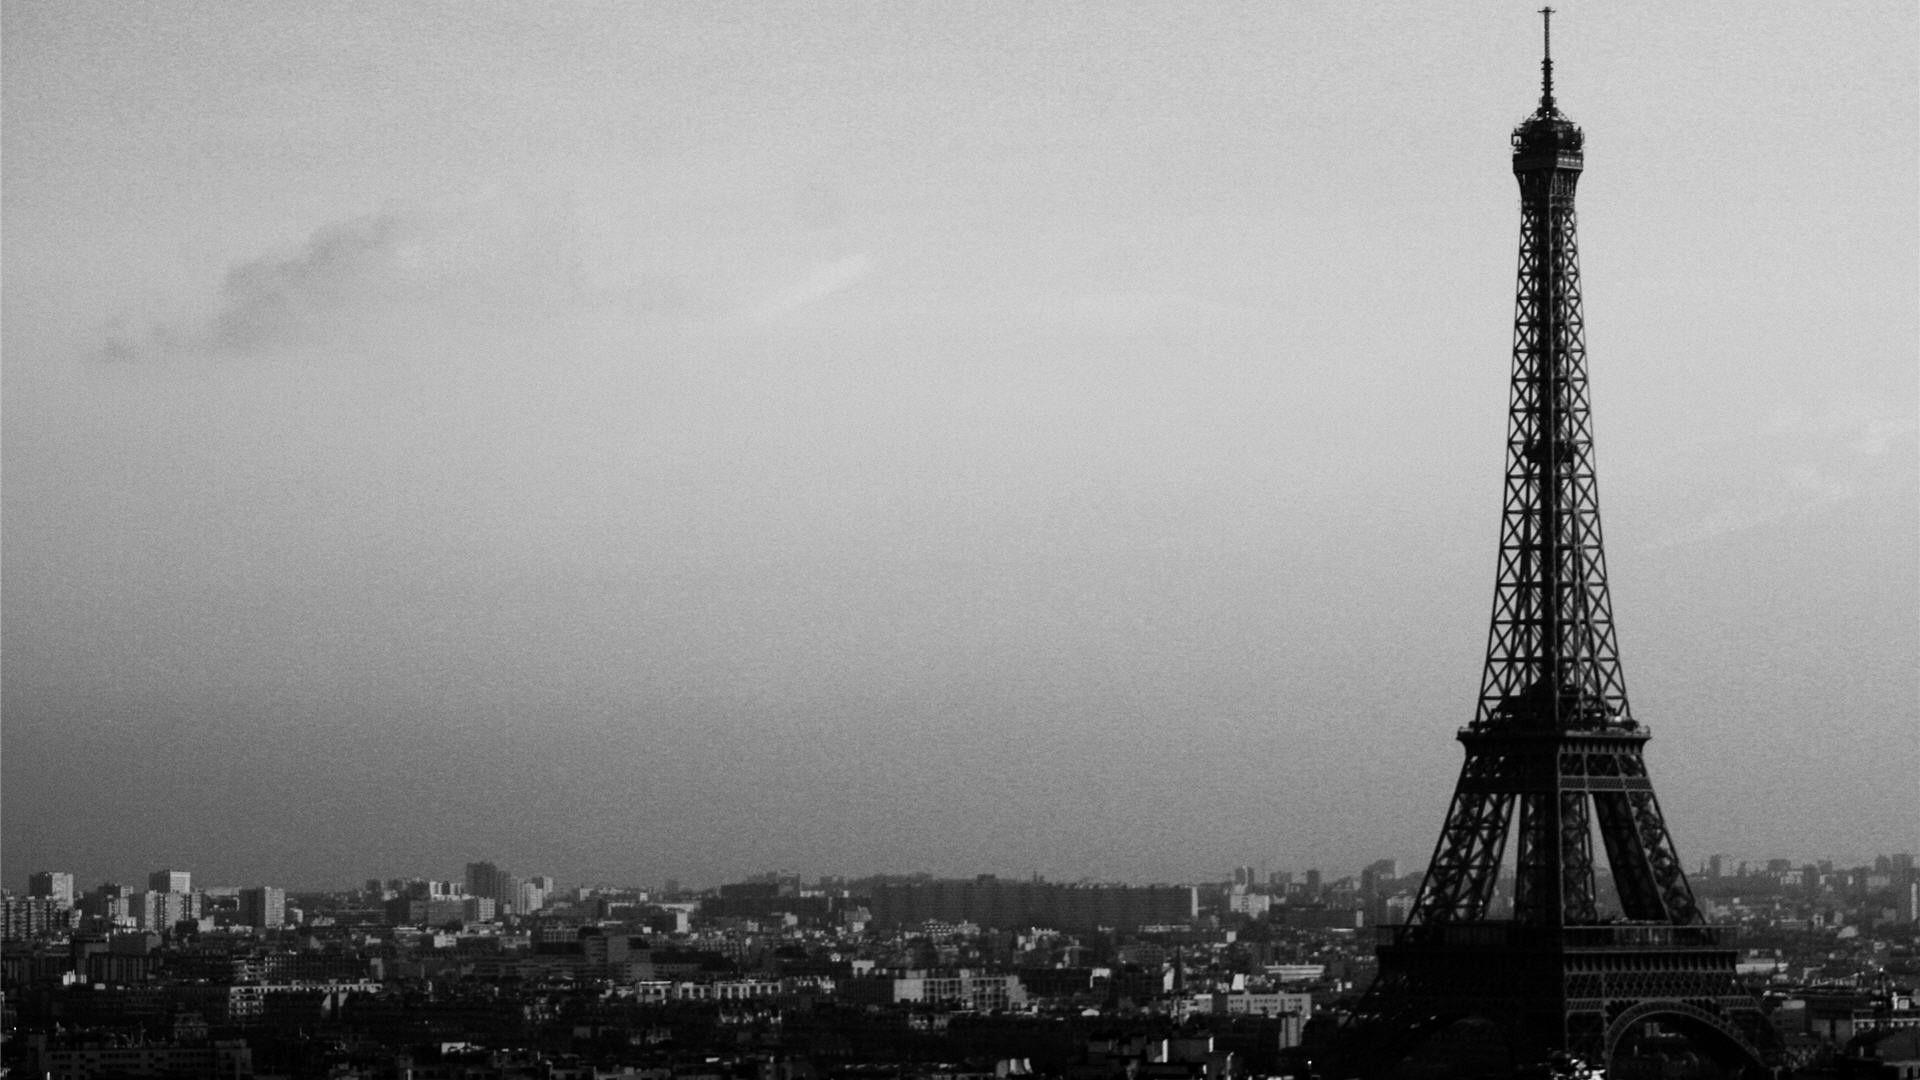 Paris Aesthetic Wallpapers Top Free Paris Aesthetic Backgrounds Wallpaperaccess